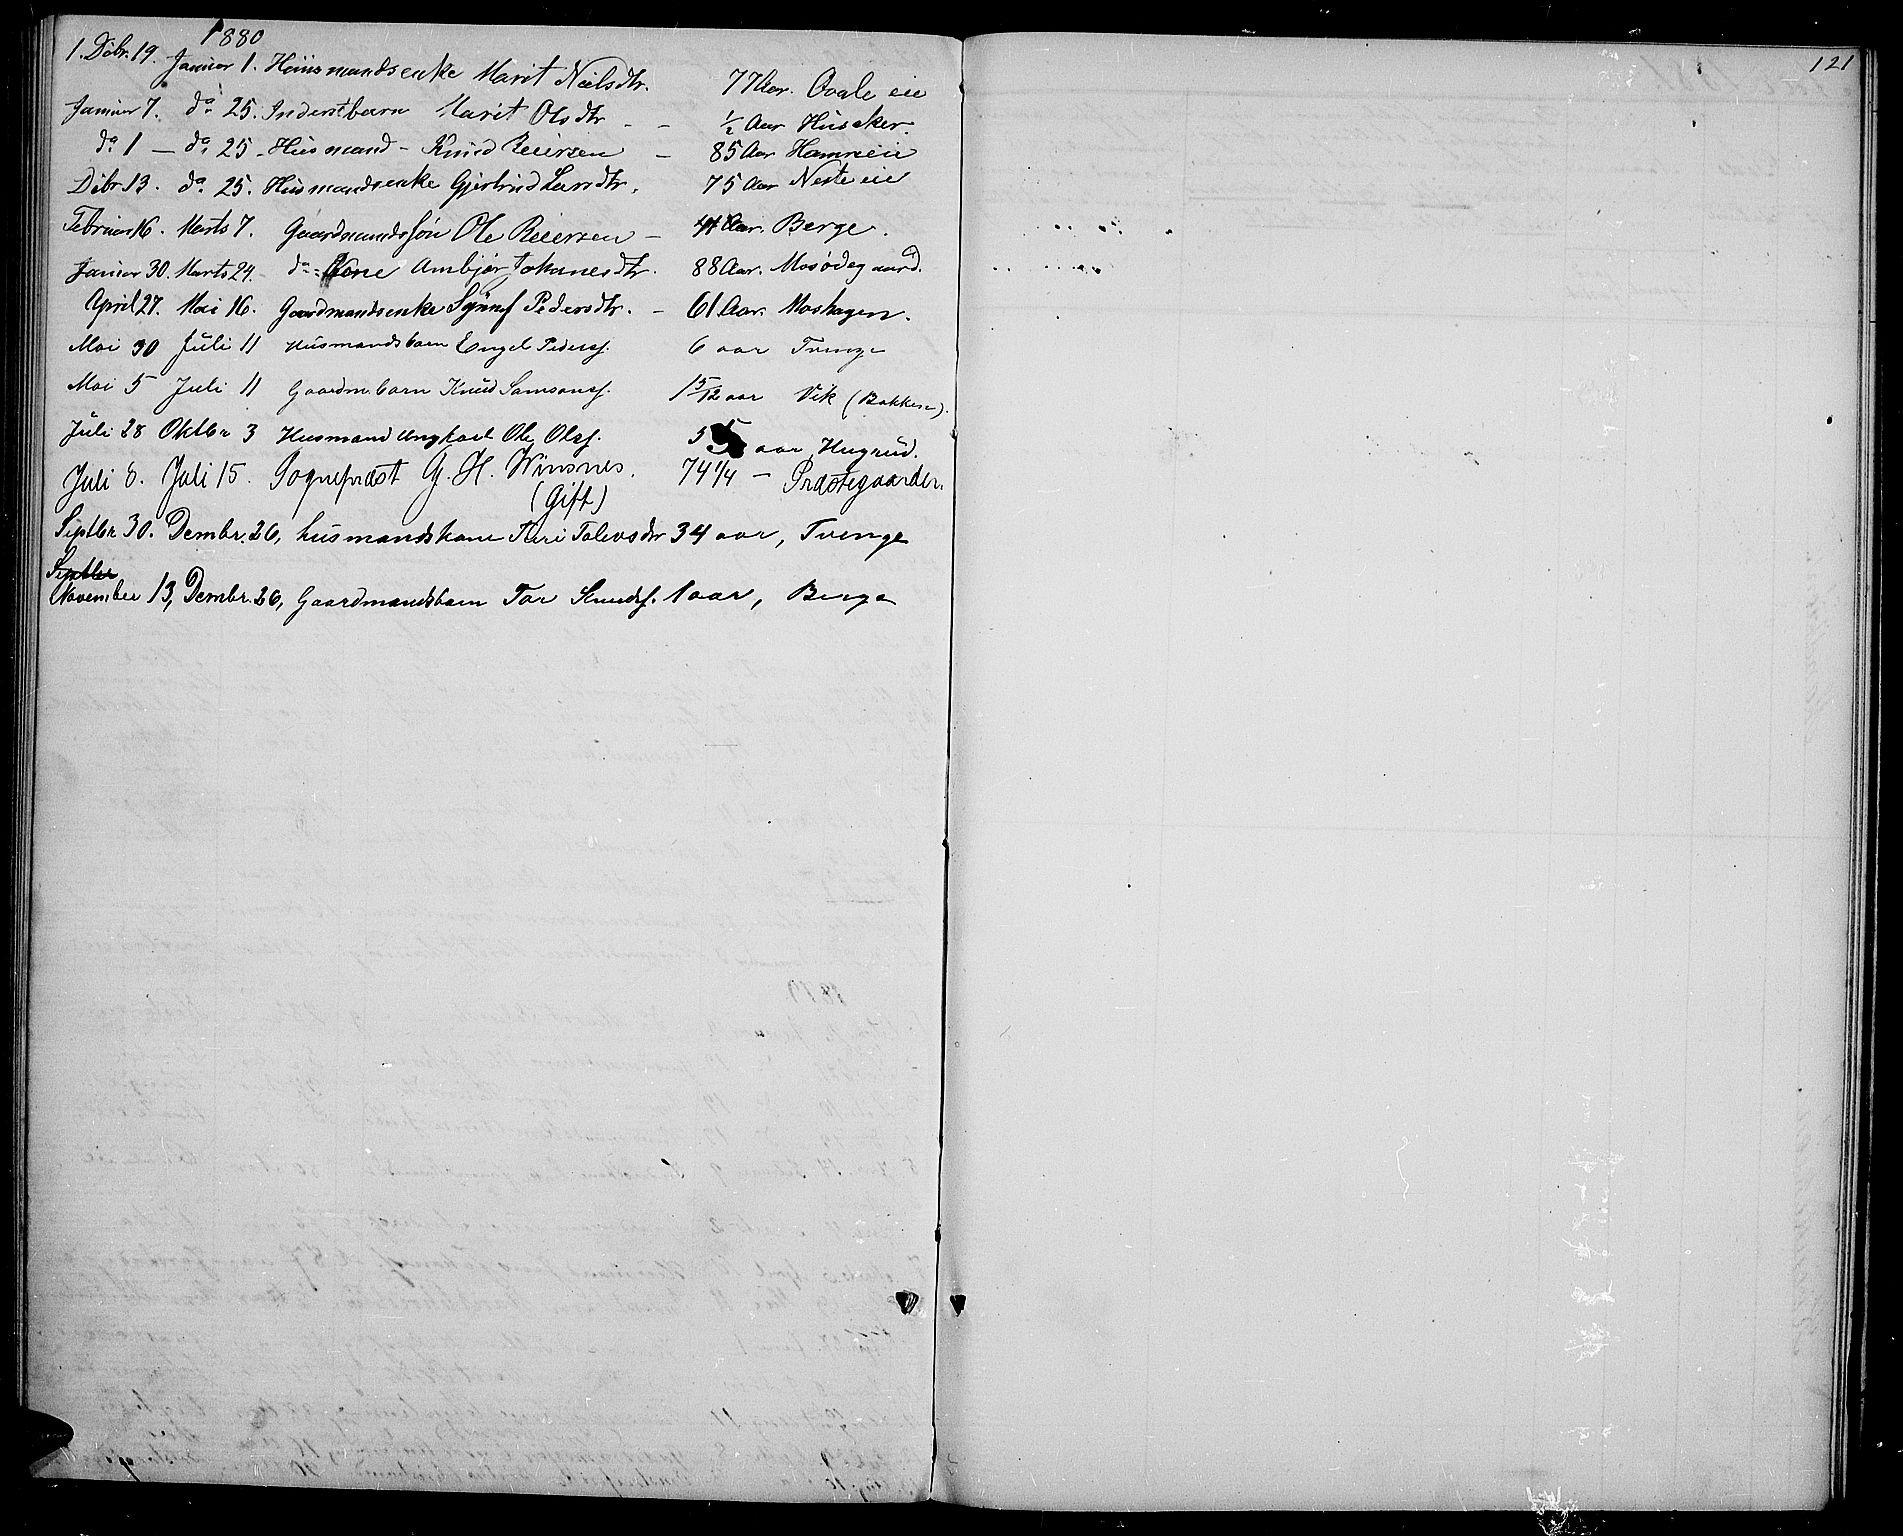 SAH, Vestre Slidre prestekontor, Klokkerbok nr. 1, 1869-1882, s. 121